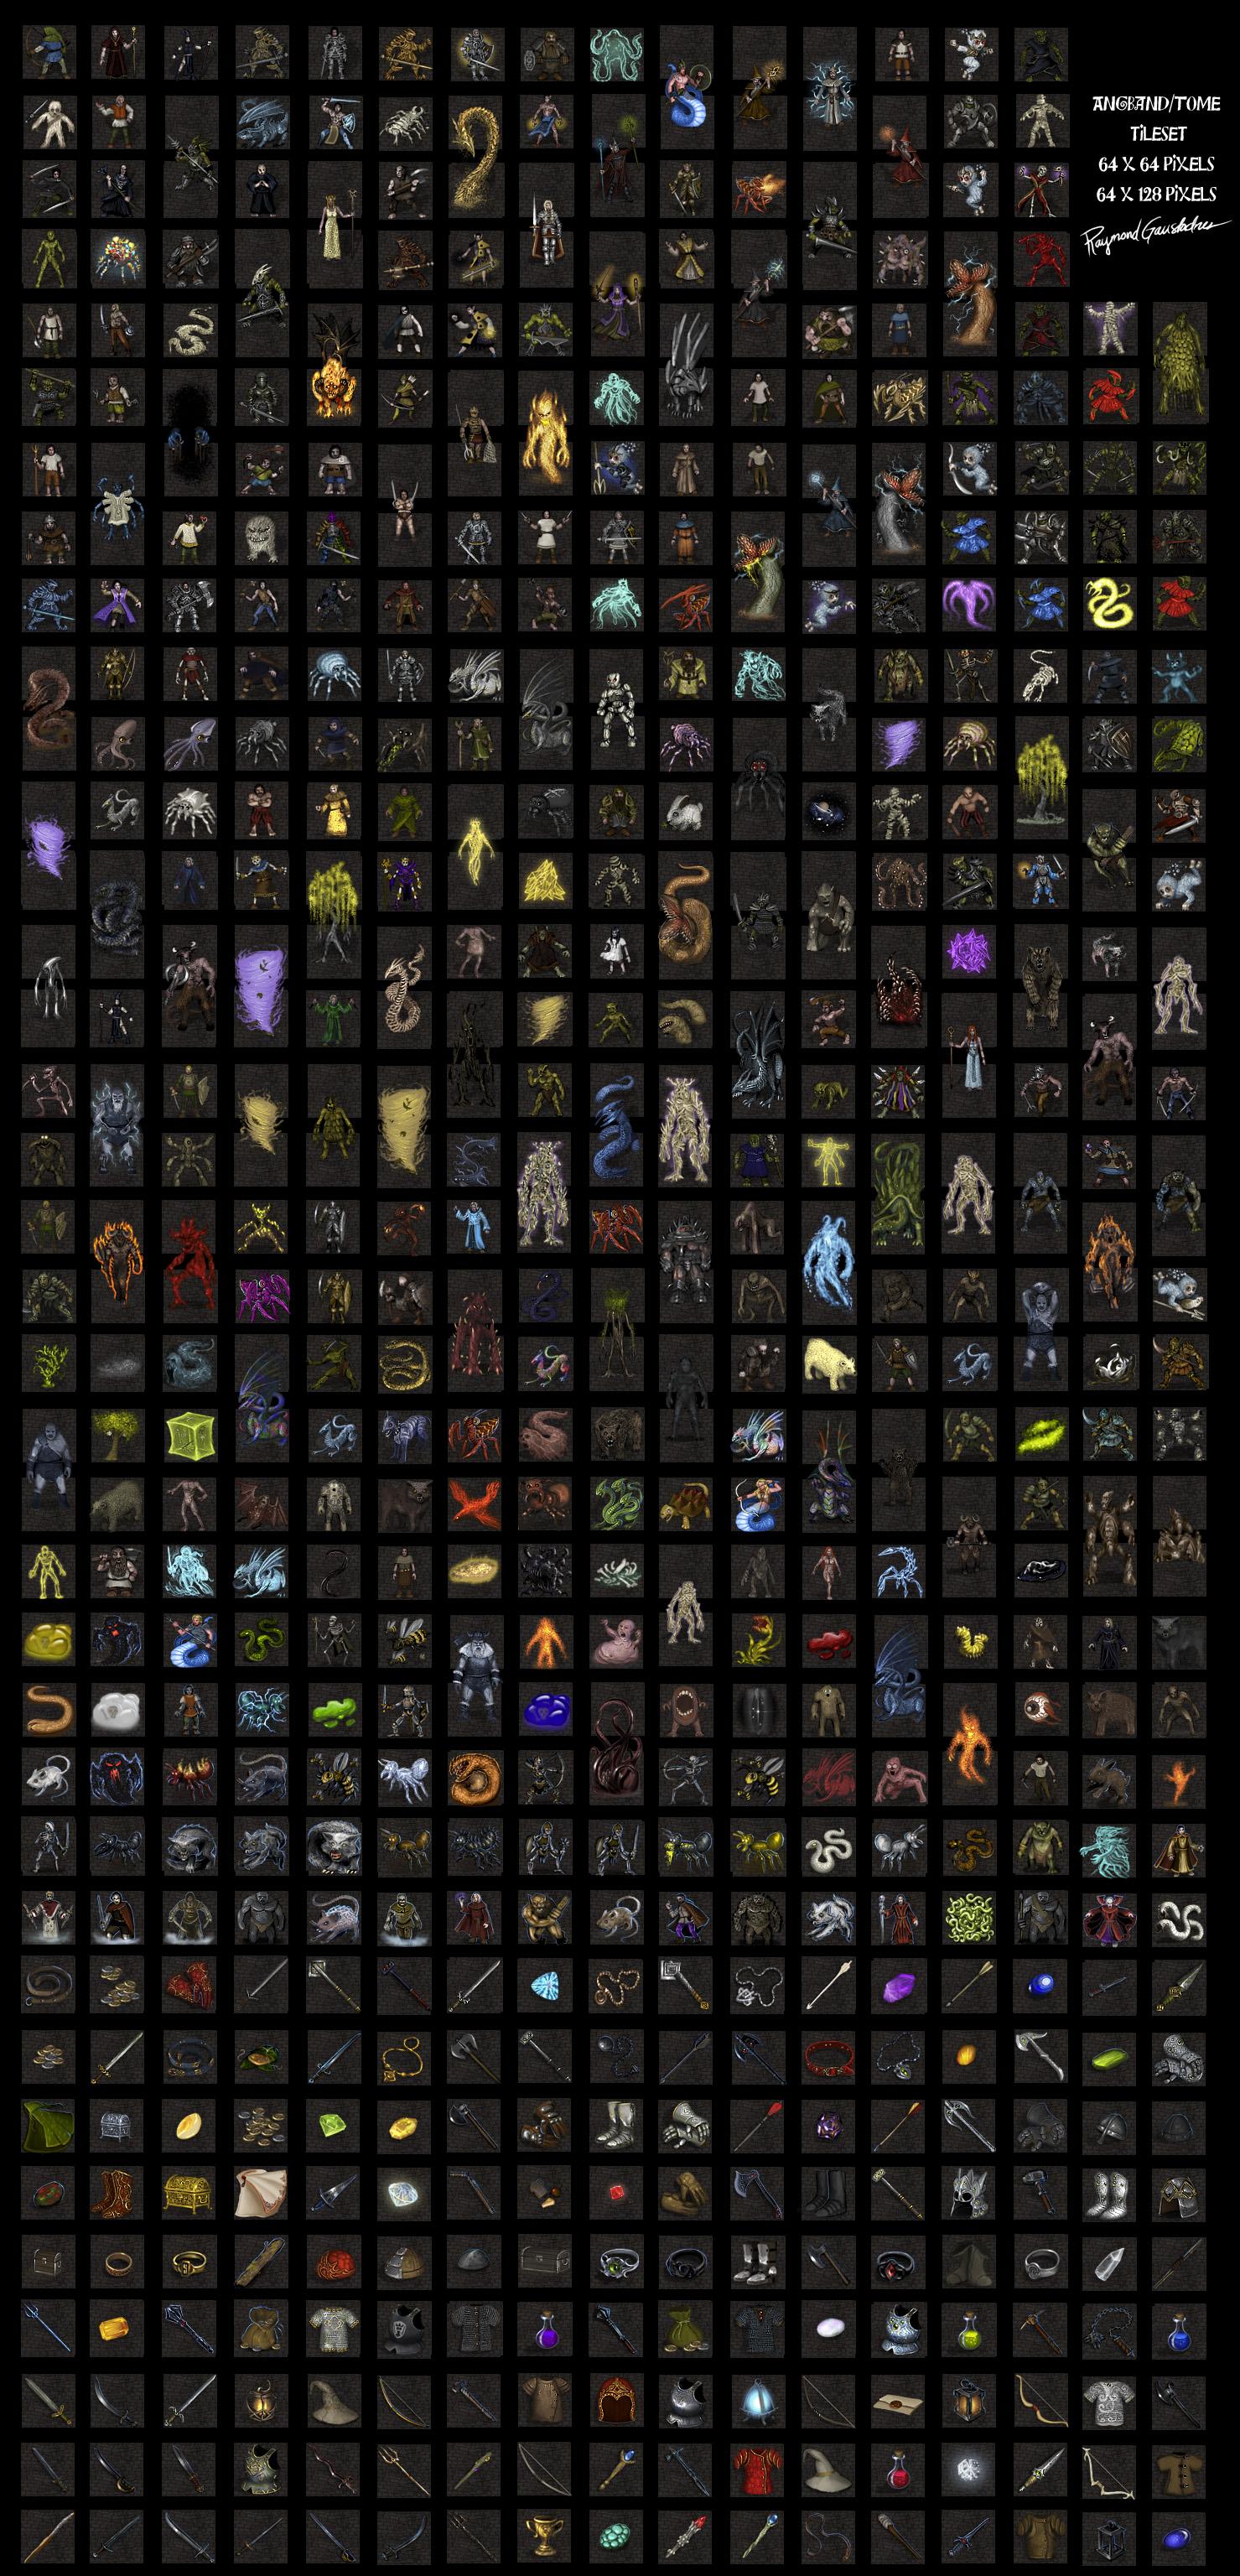 Tiles frenzy by Shockbolt on DeviantArt